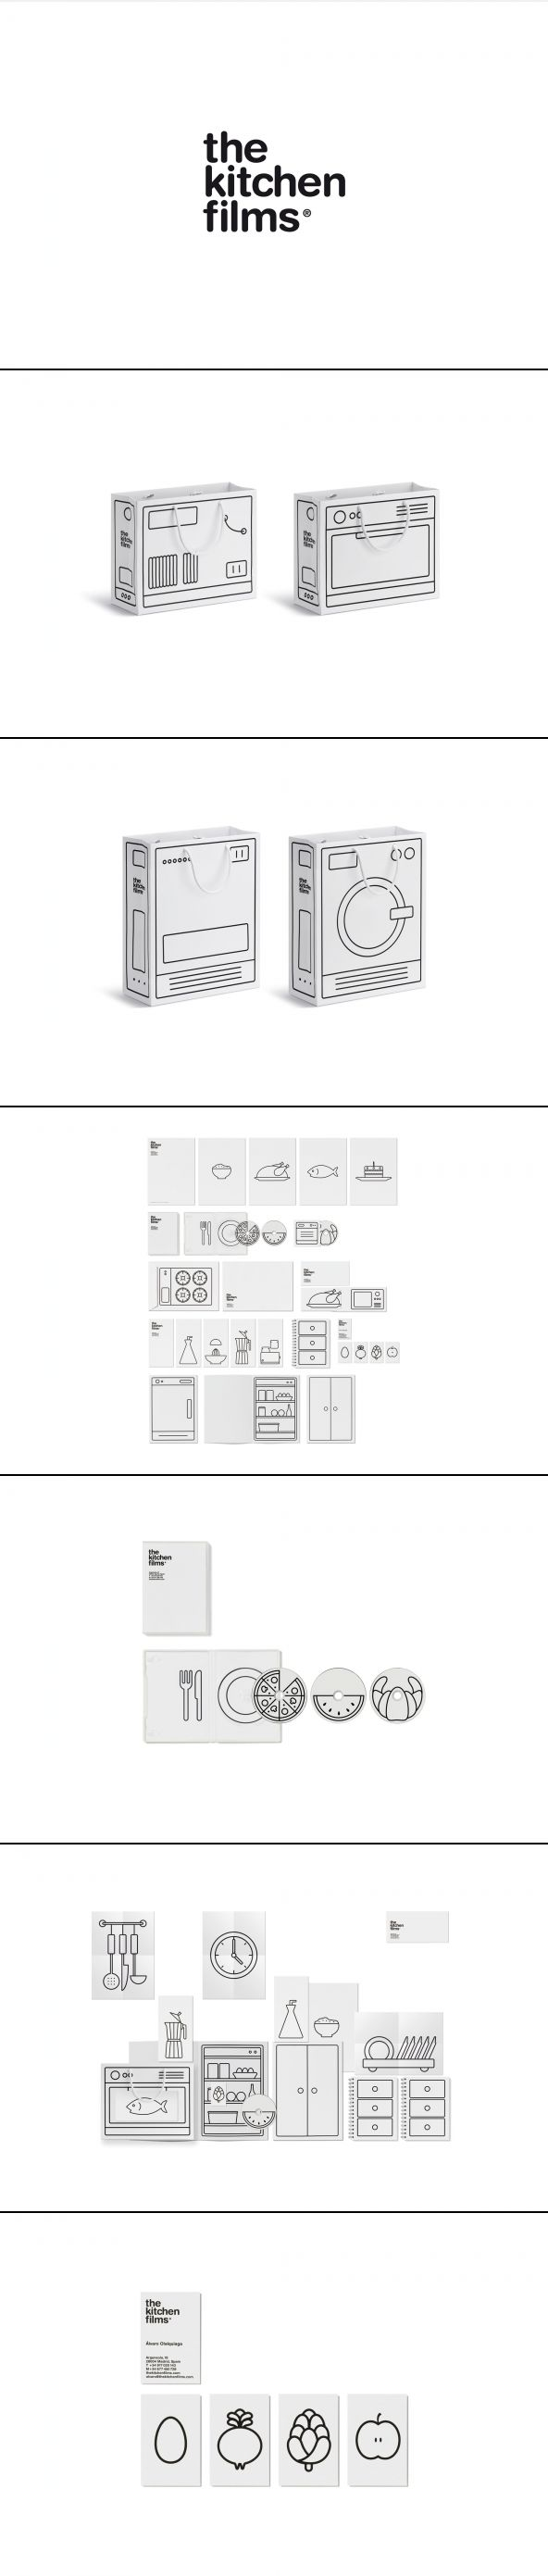 branding the Kitchen Films by Ruiz + Company